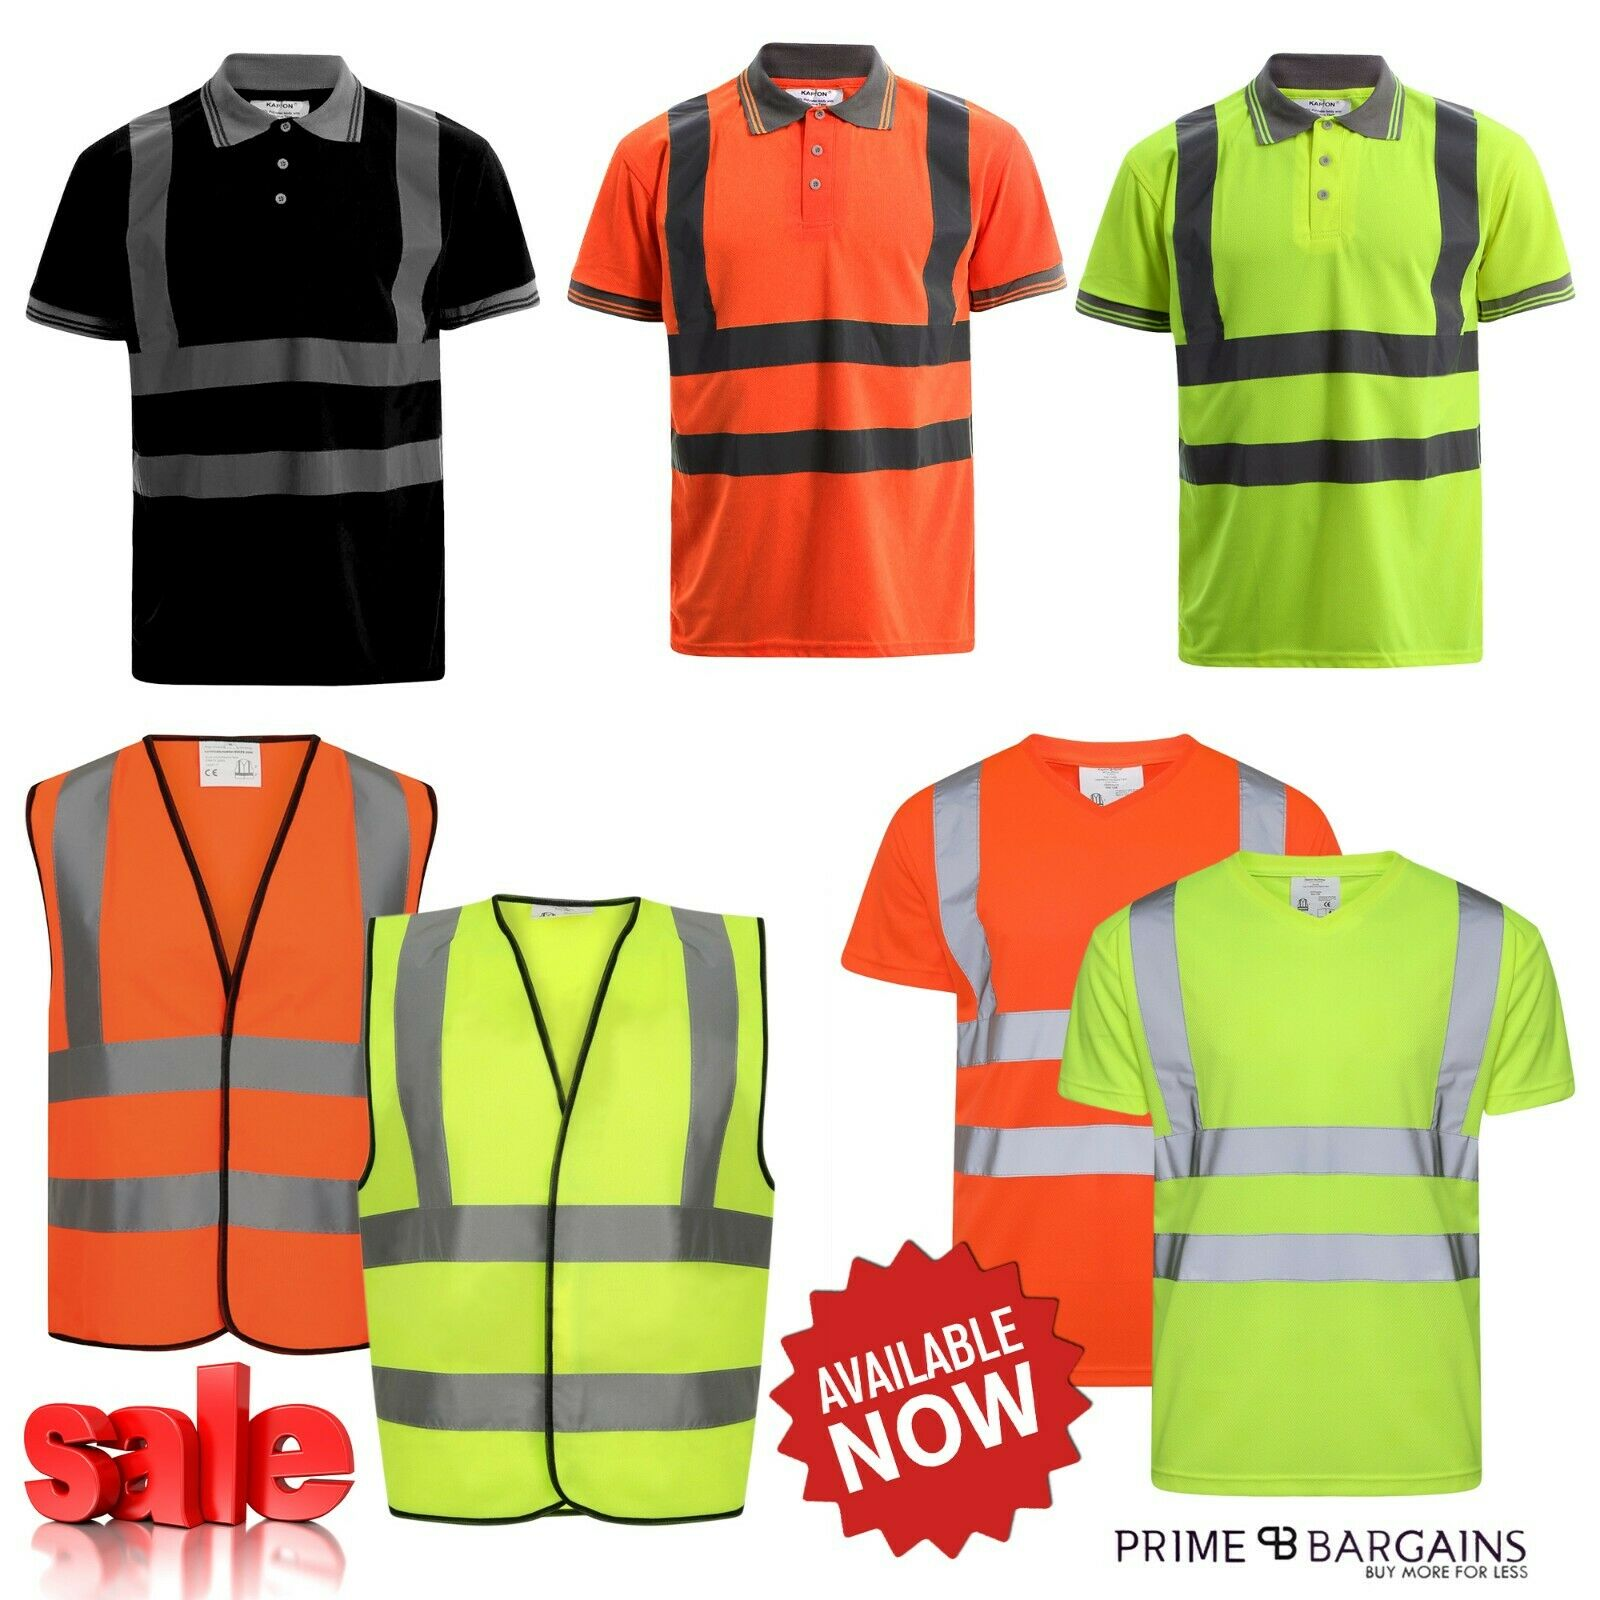 5 Pack Polo Shirts Hi Vis High Viz Visibility Short Sleeve Safety Work-wear Shirt